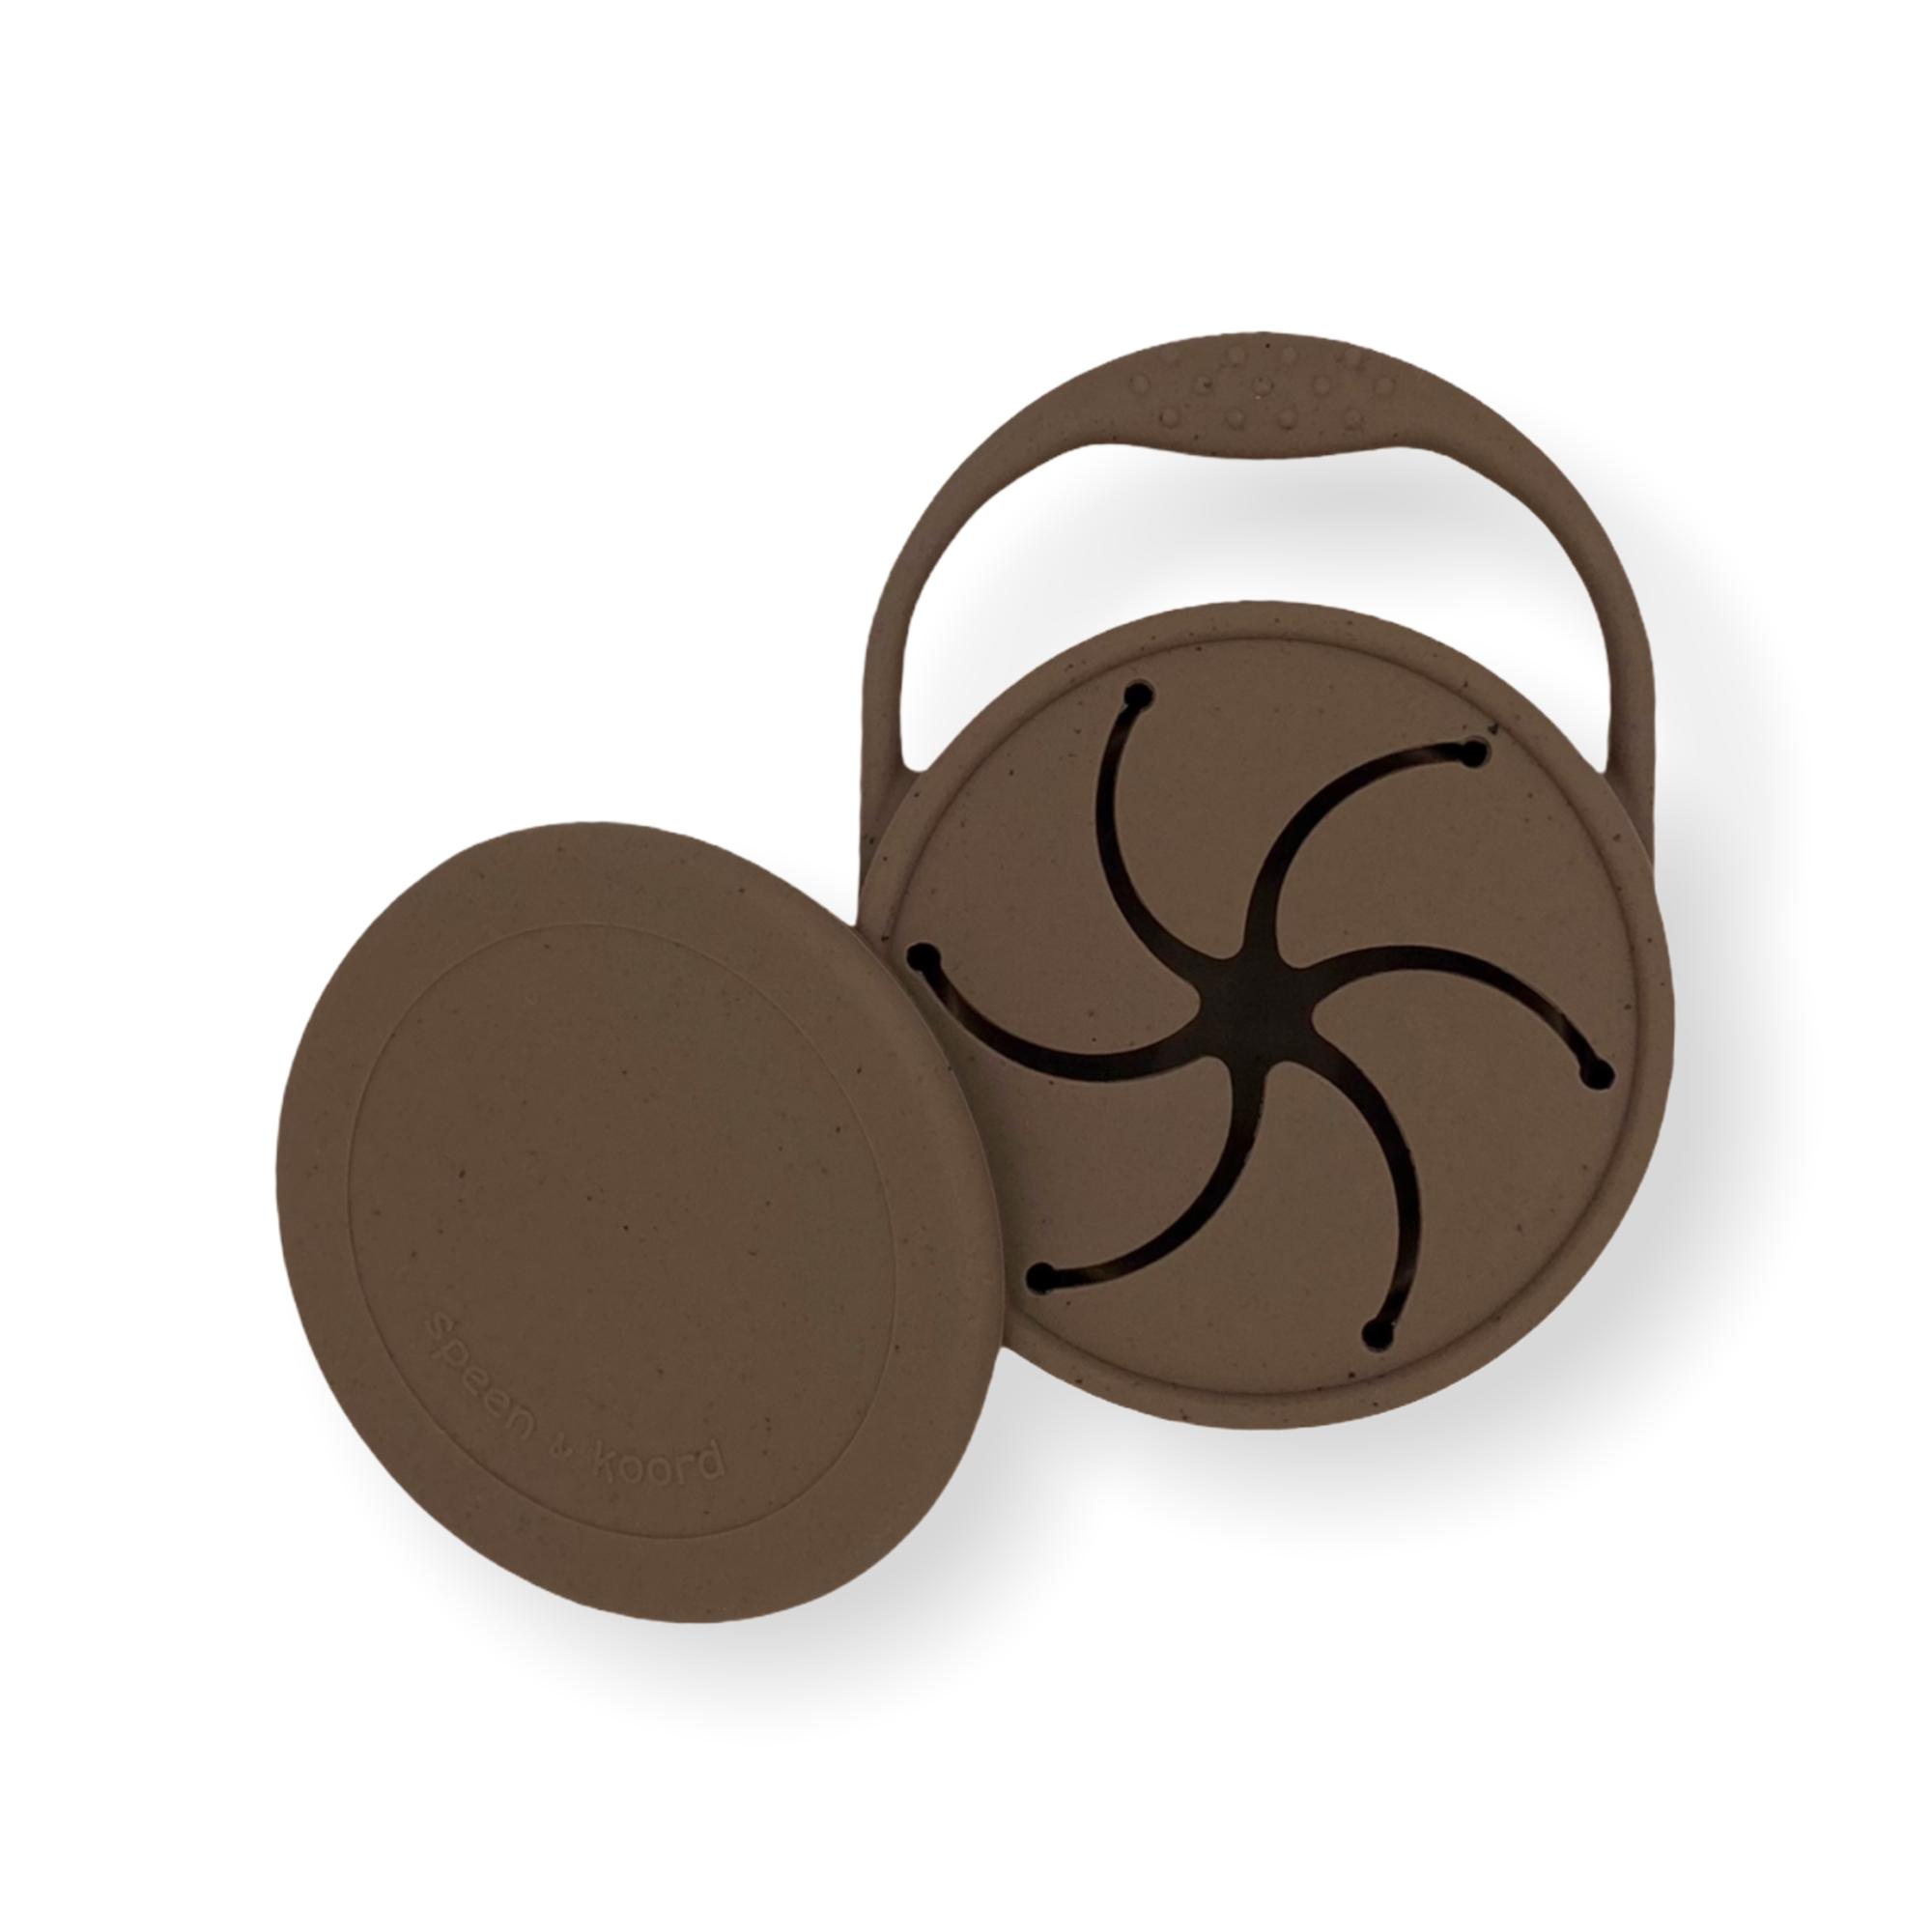 Afbeelding Speen & Koord Snack cups I Speckled Coffee